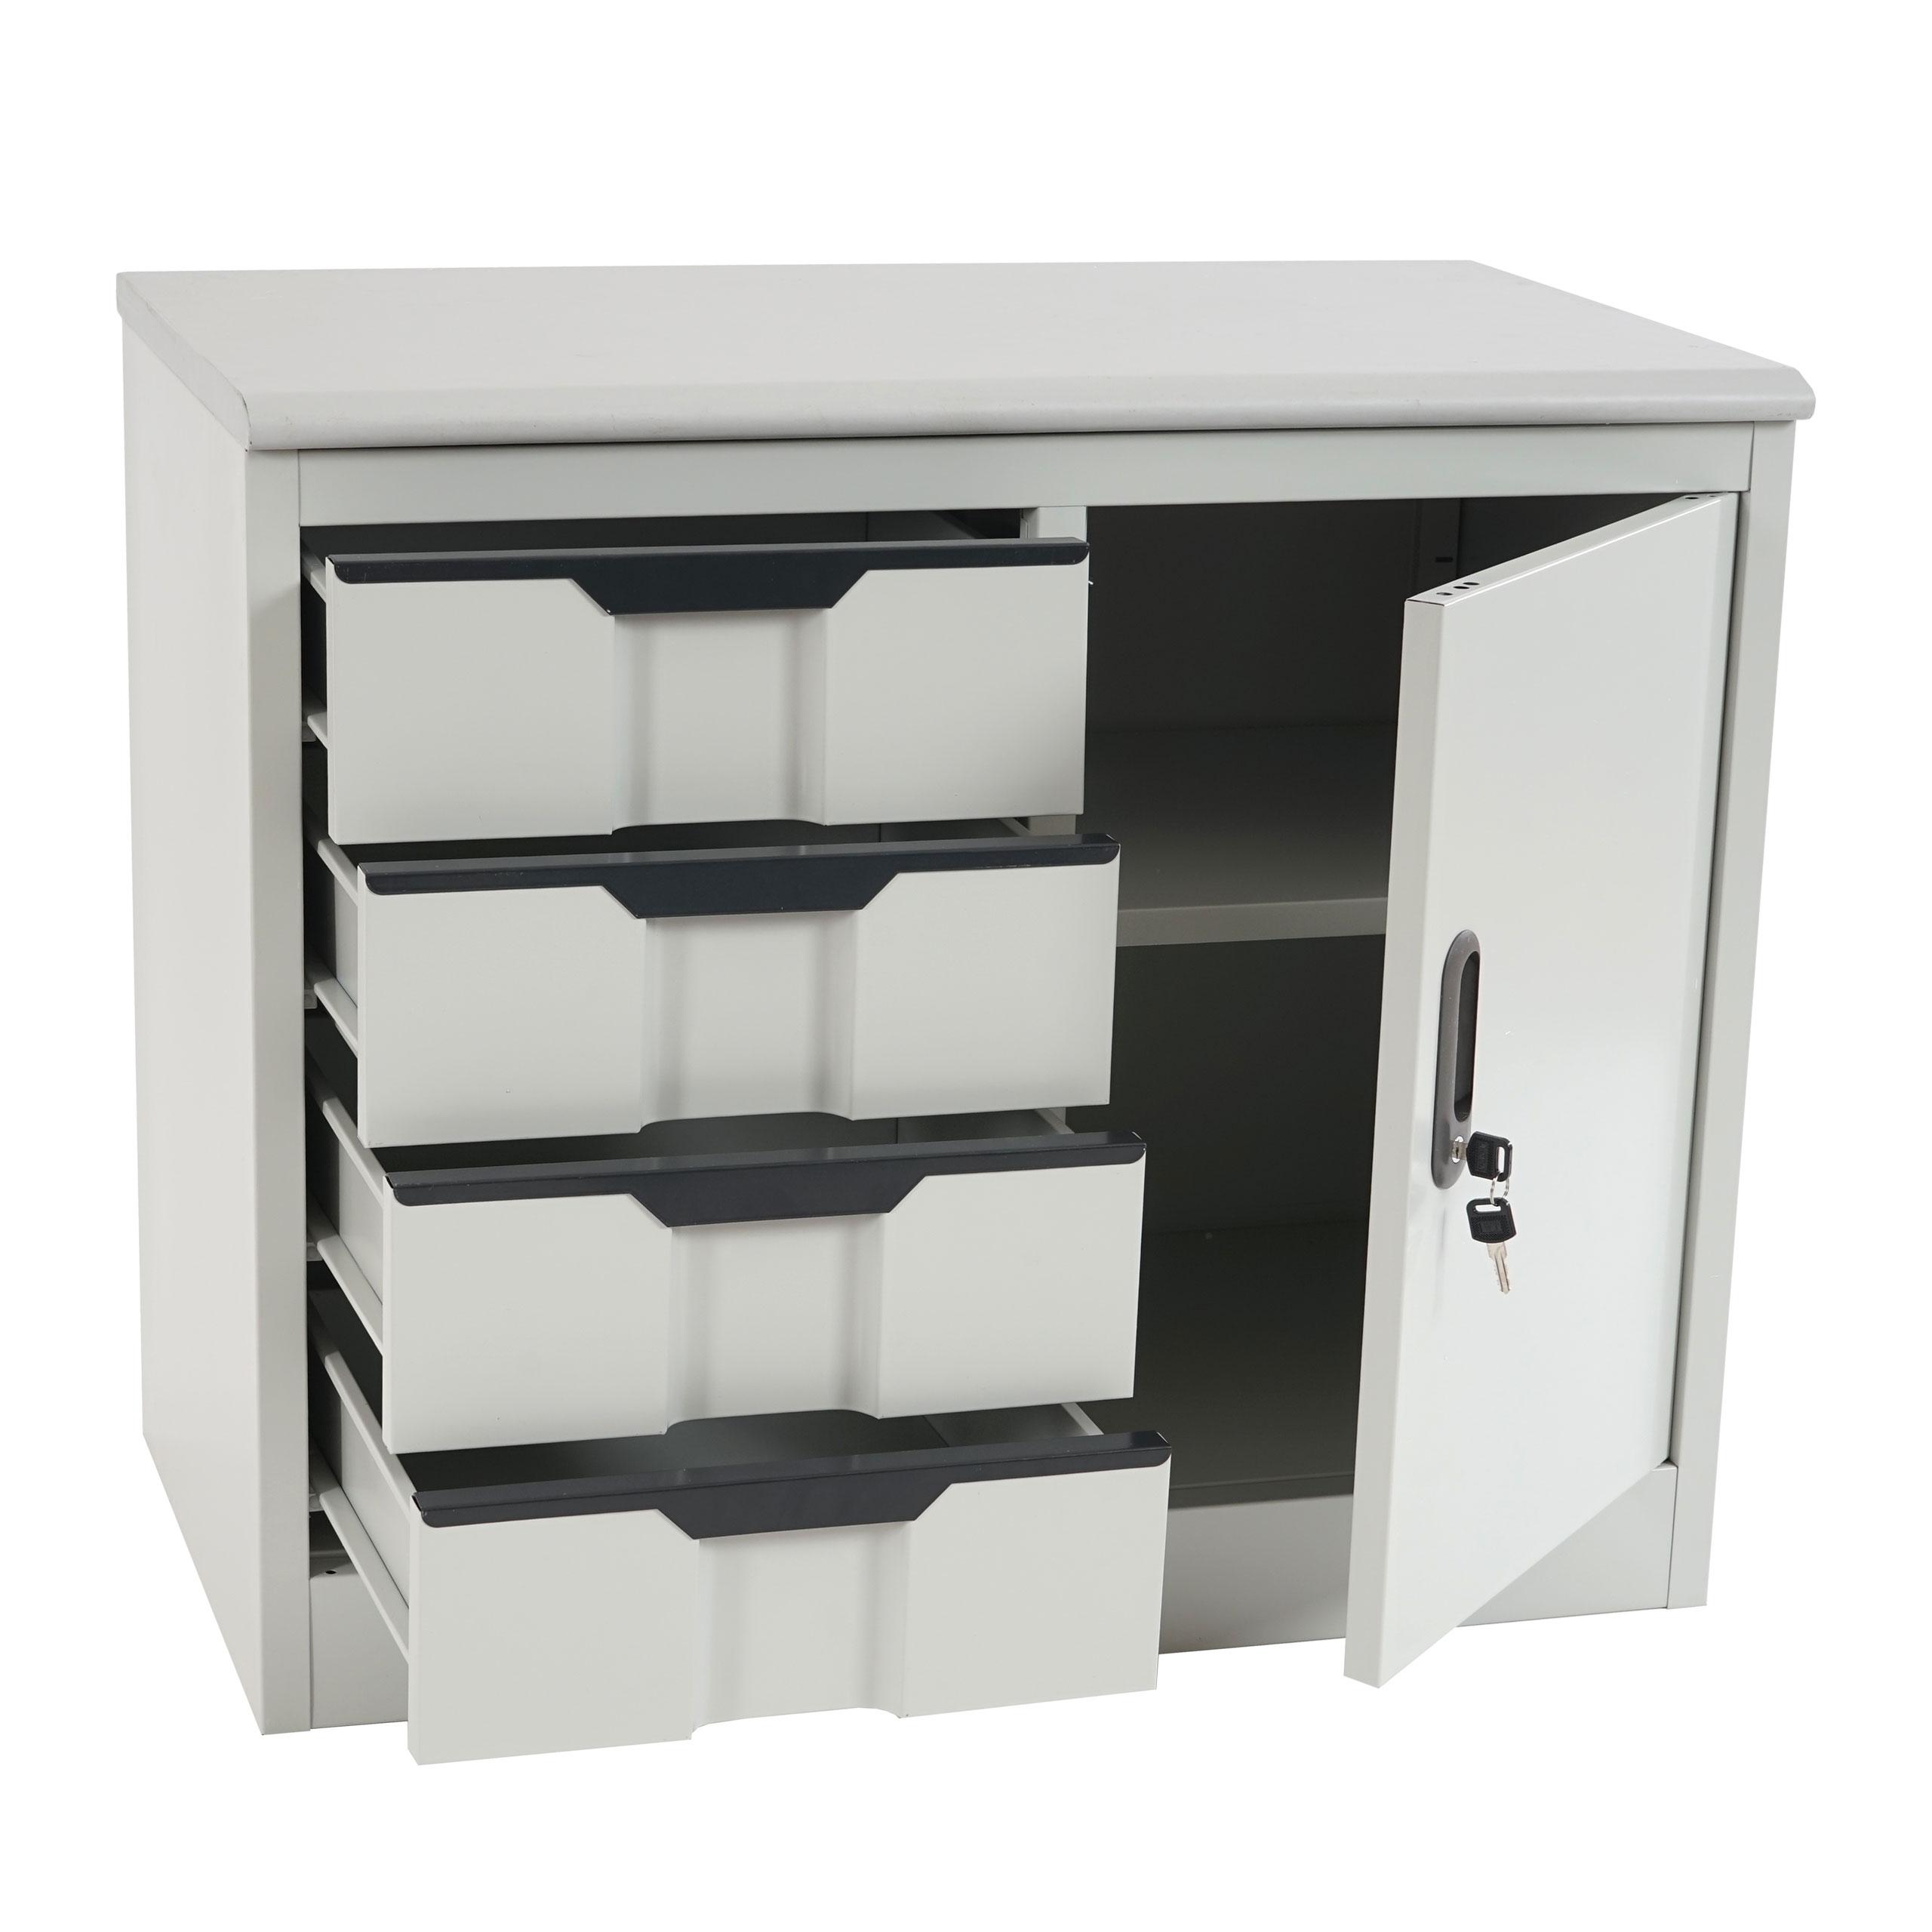 aktenschrank preston t310 b roschrank metallschrank 4. Black Bedroom Furniture Sets. Home Design Ideas